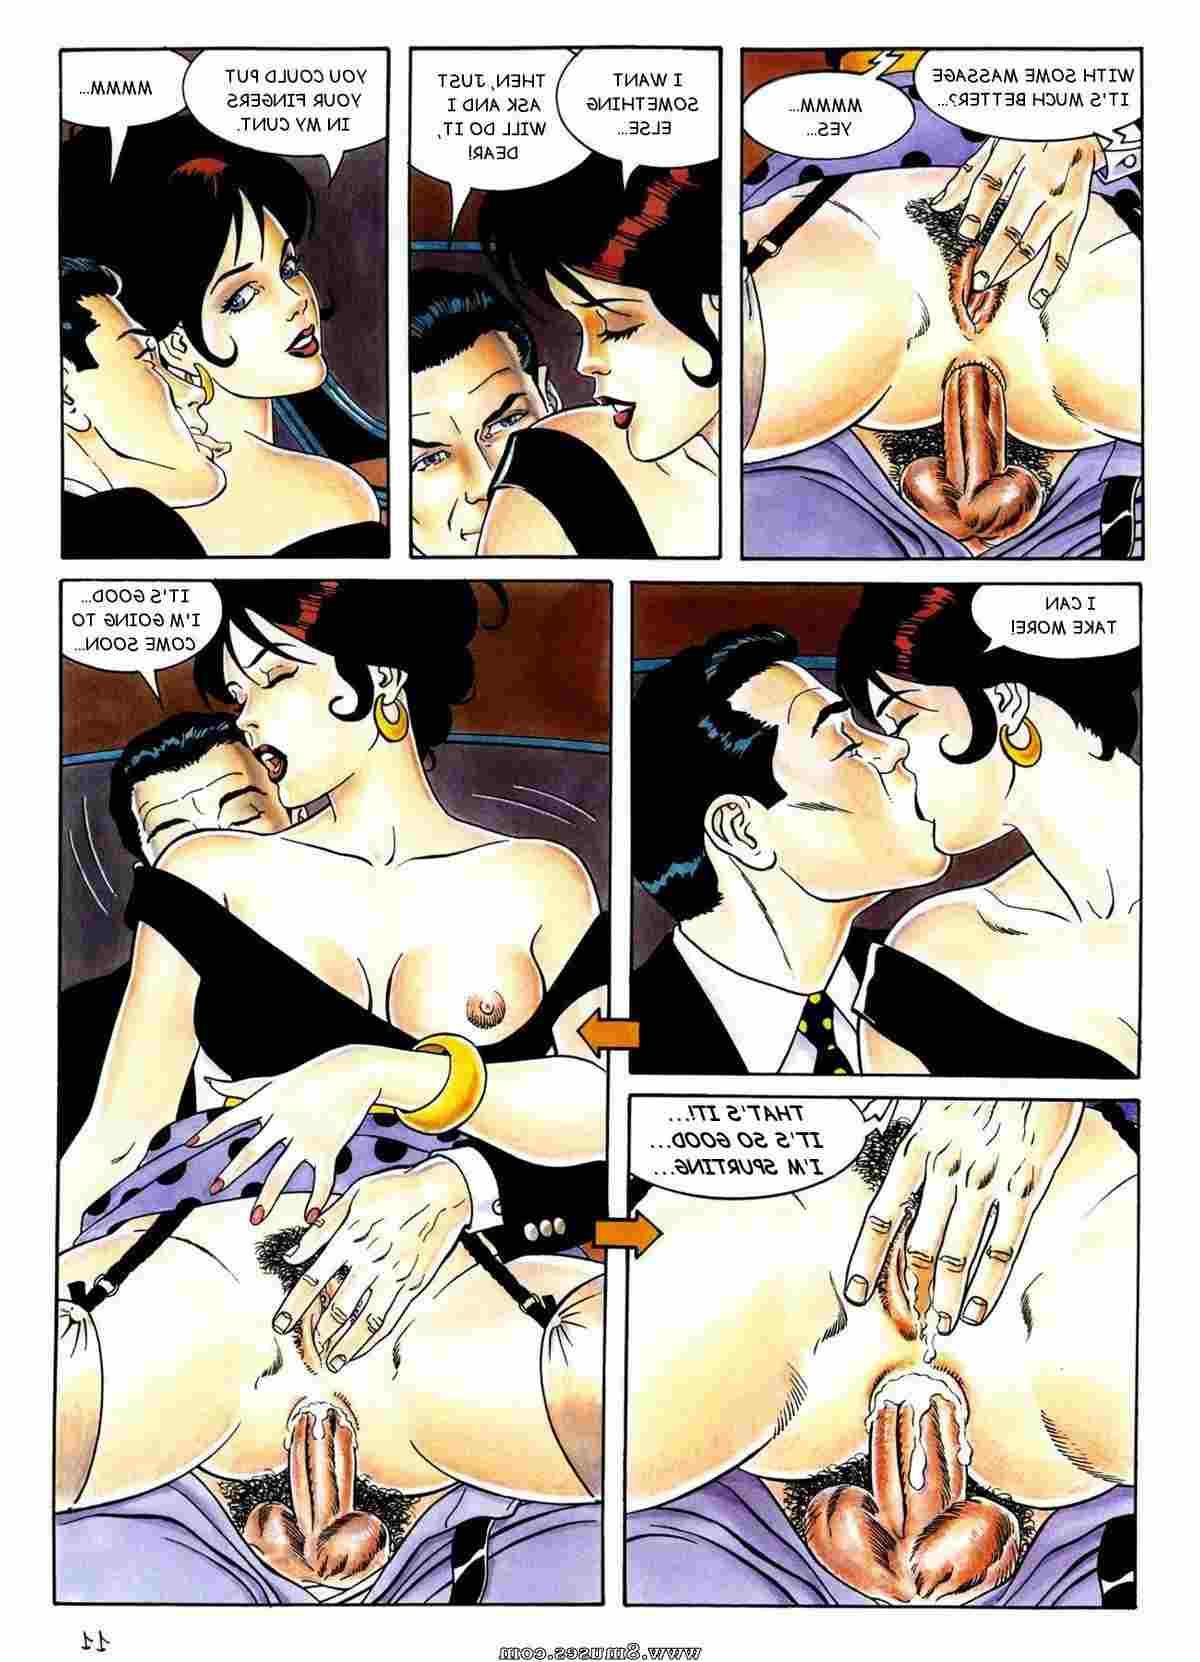 Stramaglia-Morale-Comics/Anna-Perverted-Innocence Anna_Perverted_Innocence__8muses_-_Sex_and_Porn_Comics_14.jpg